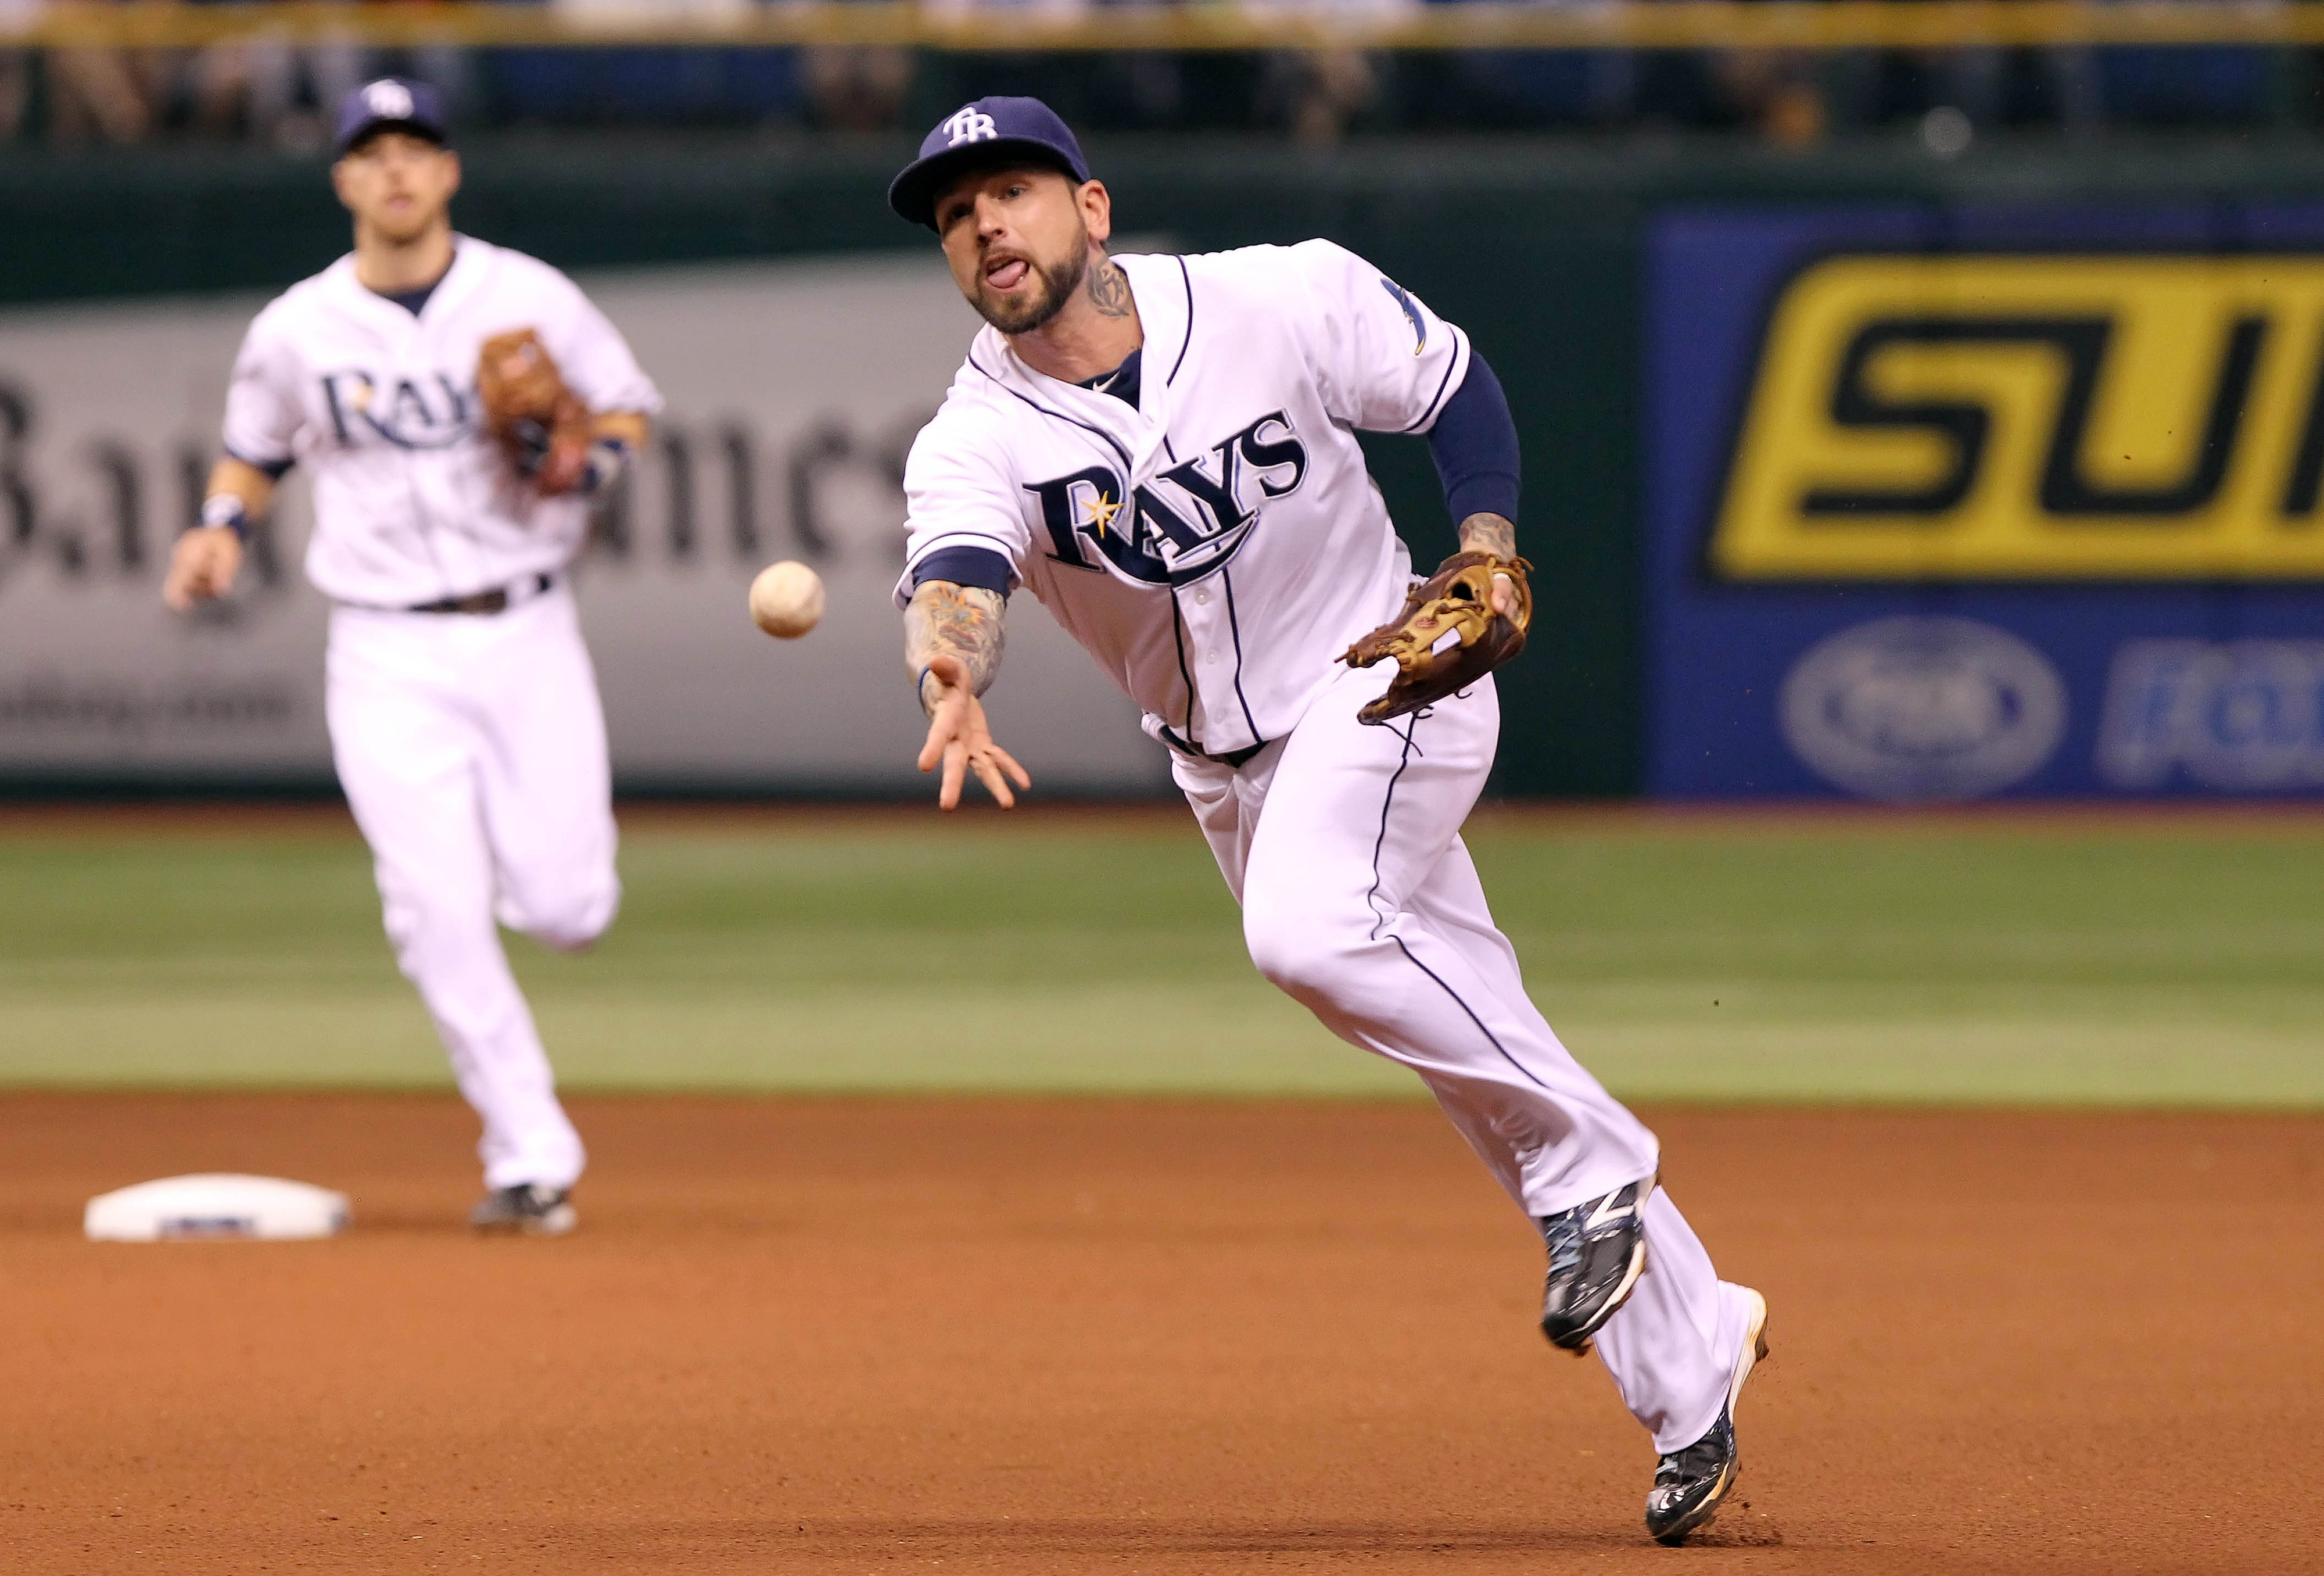 Ryan Roberts, good fielder.